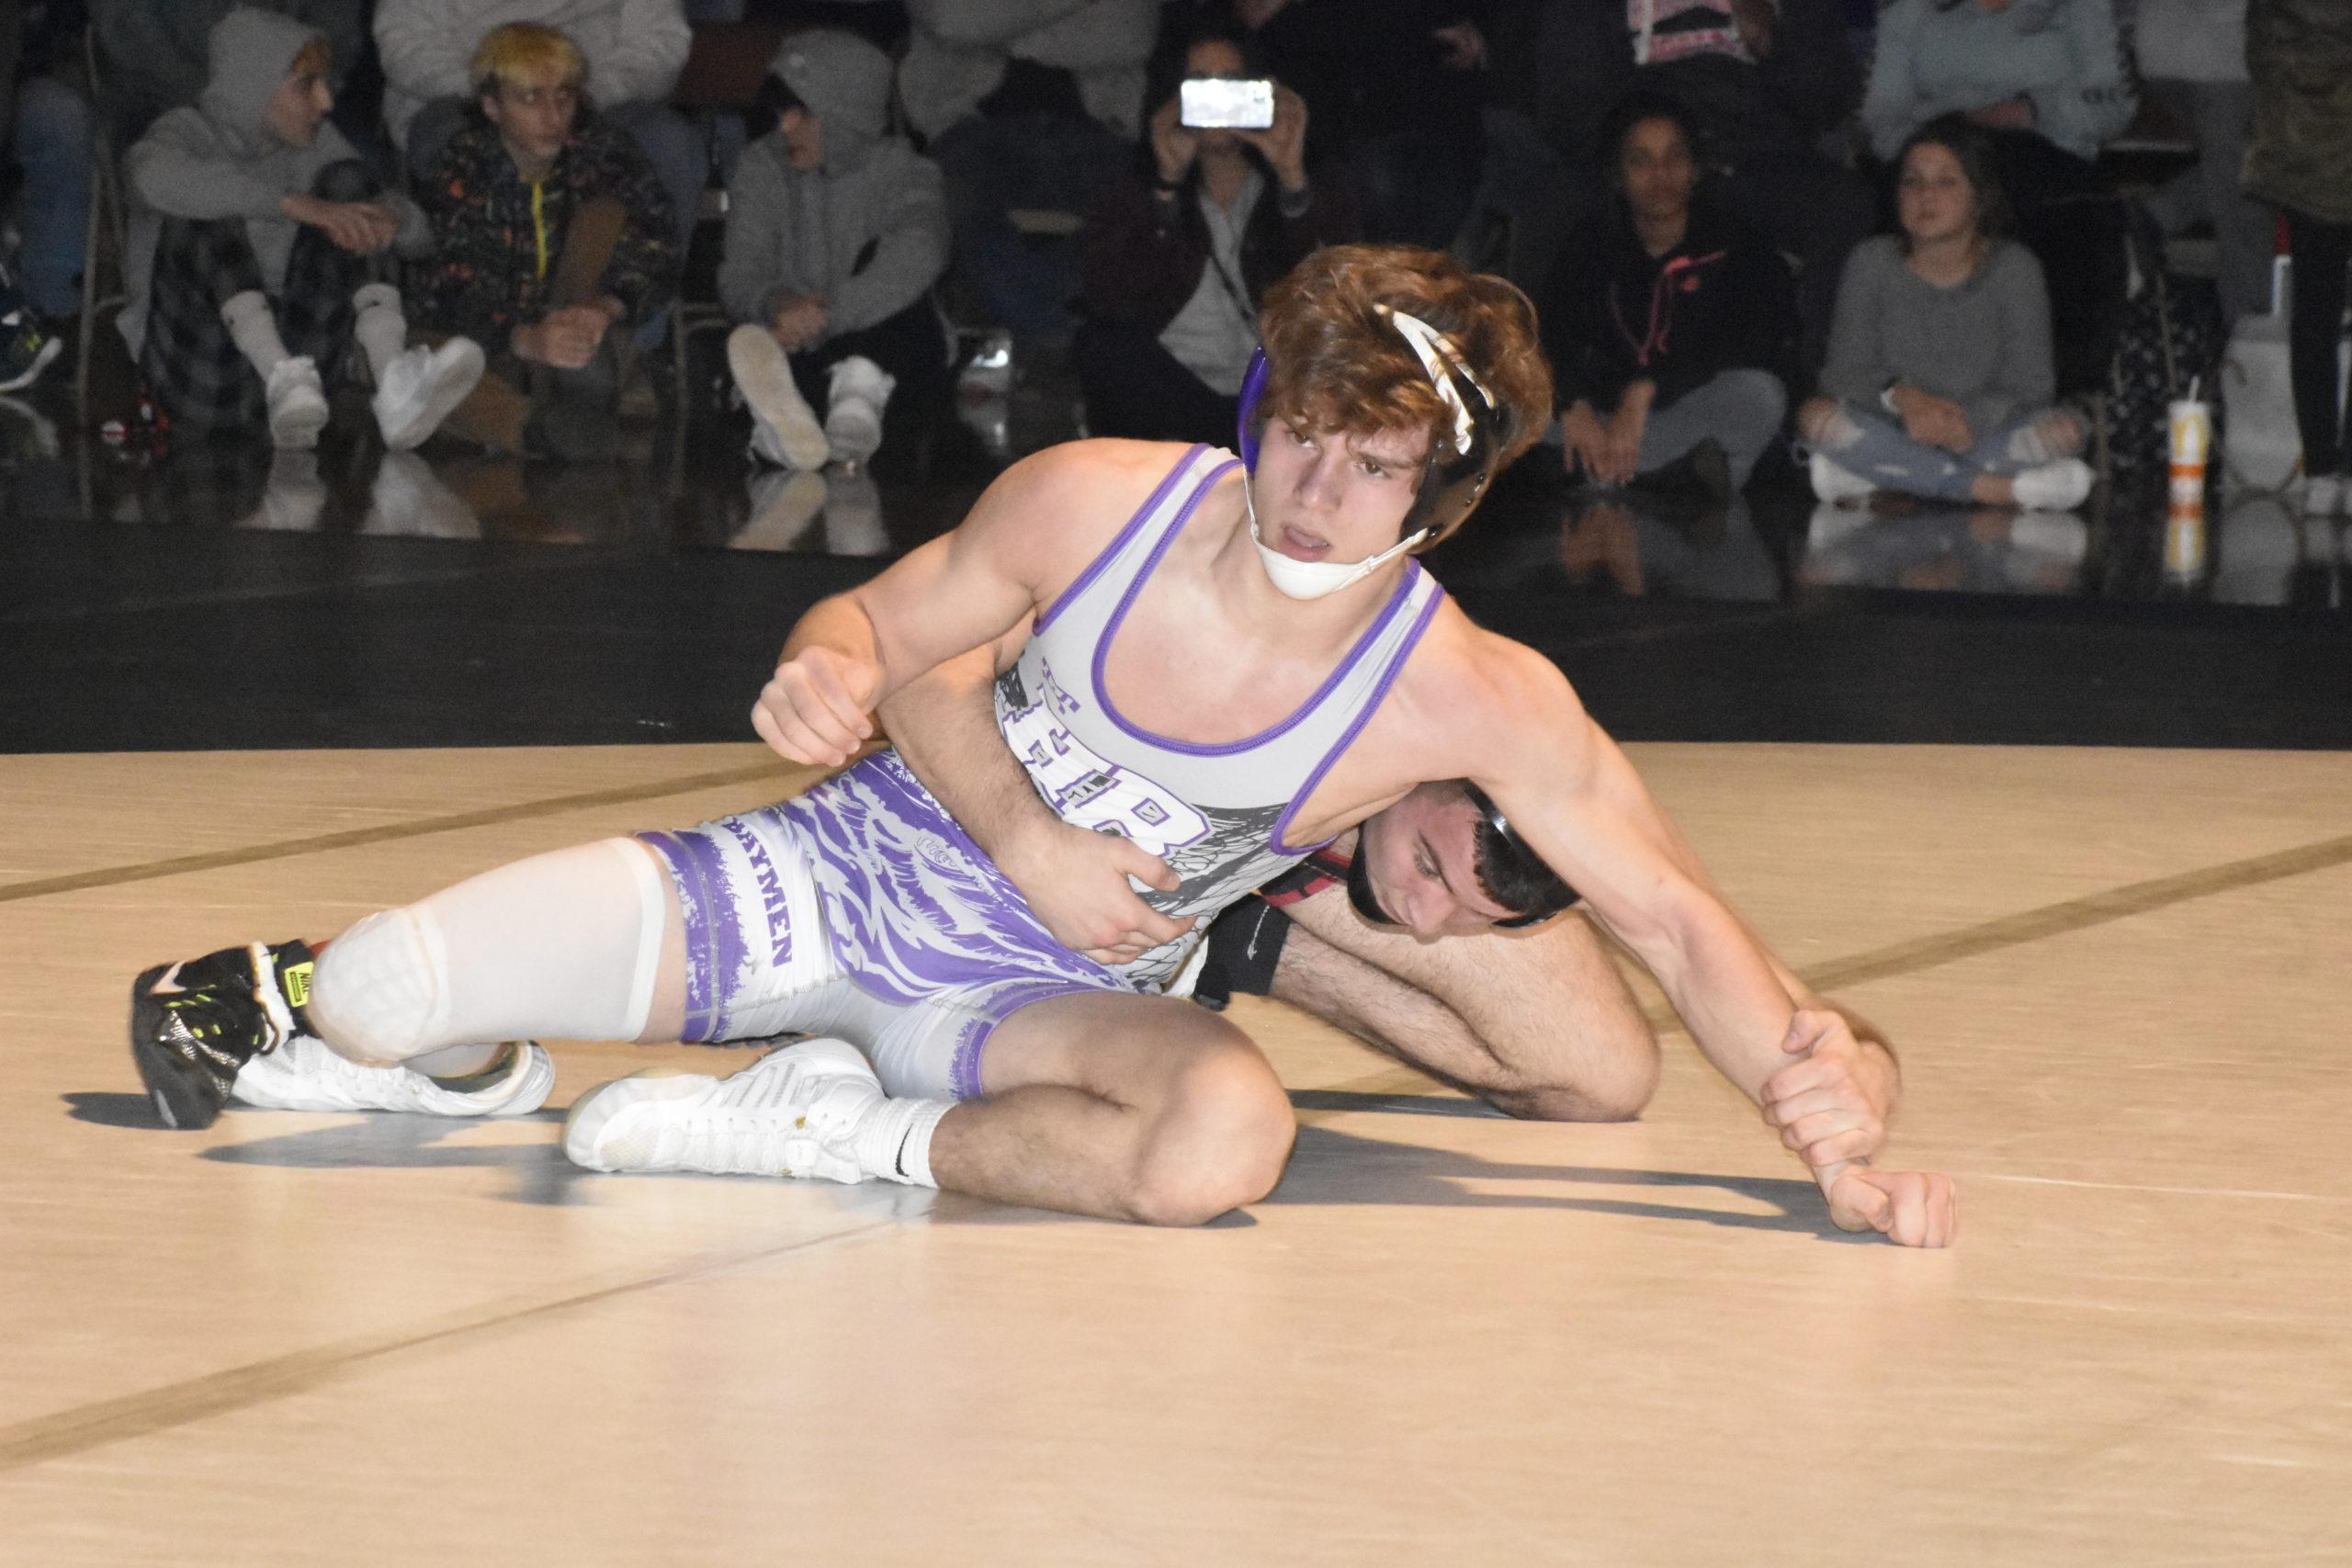 Hampton Bays junior River Orlando battled Mount Sinai's Mike O'Brien in the county final.